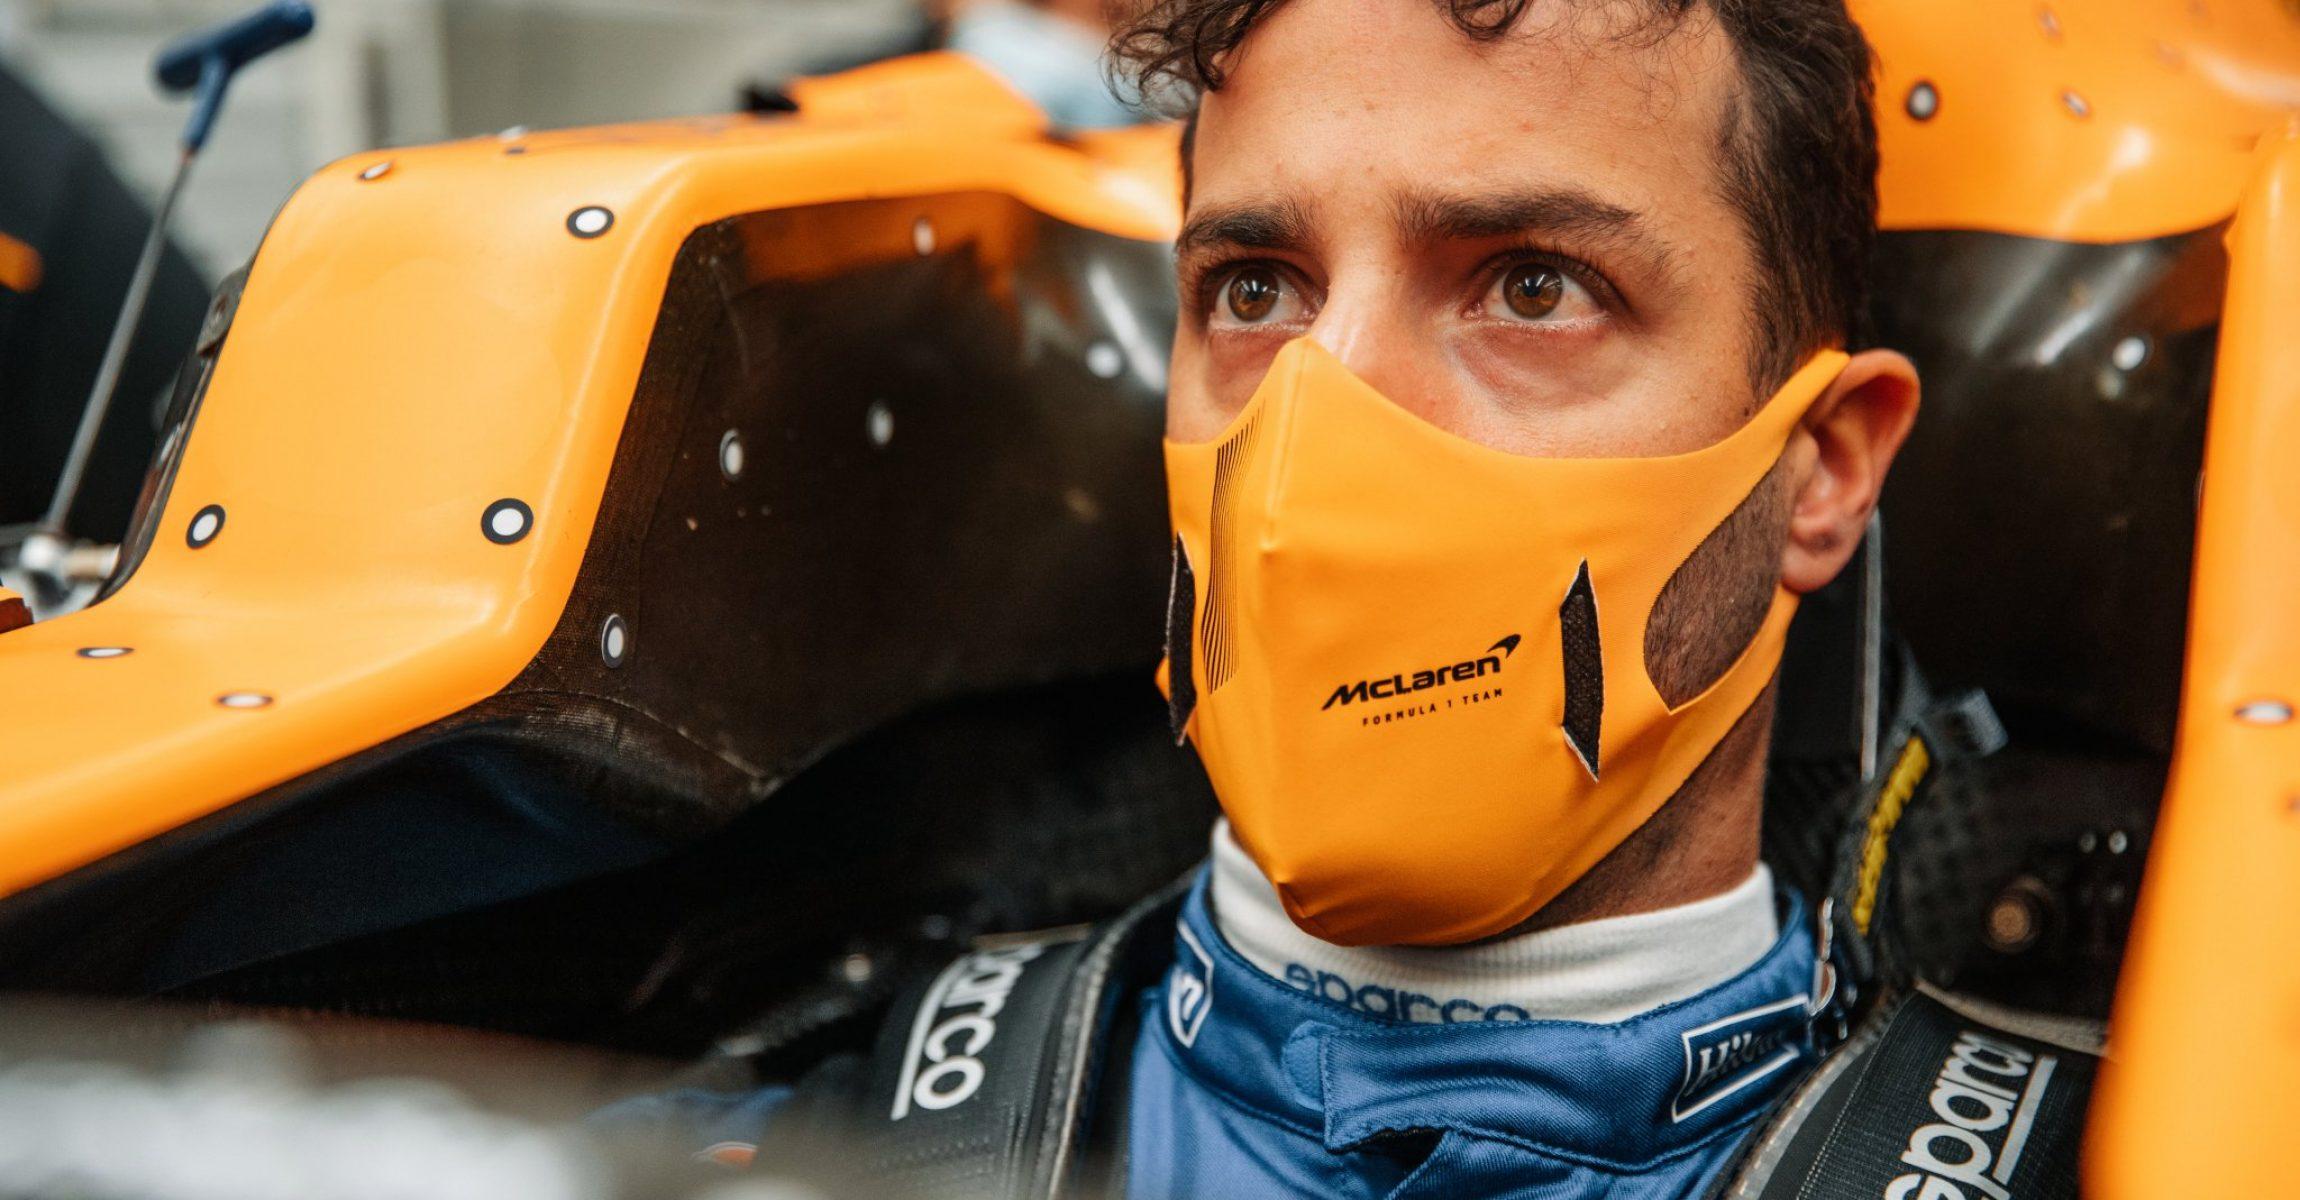 Daniel Ricciardo, McLaren MCL35M seat fit